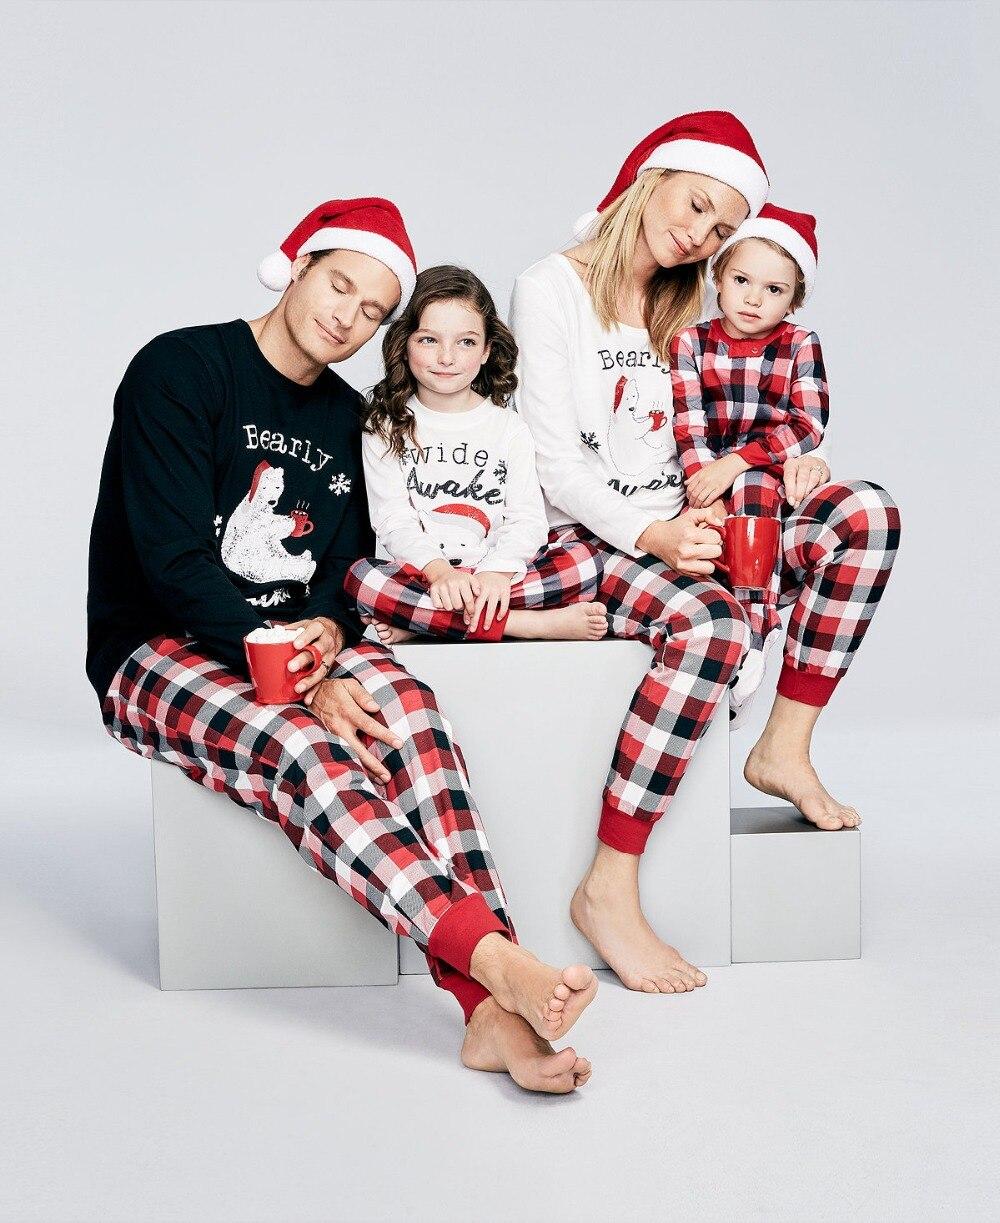 2018 New Plaid Christmas Pajamas Set Family Matching Outfits Xmas BEARLY AWAKE Mother Father Kid Family Set